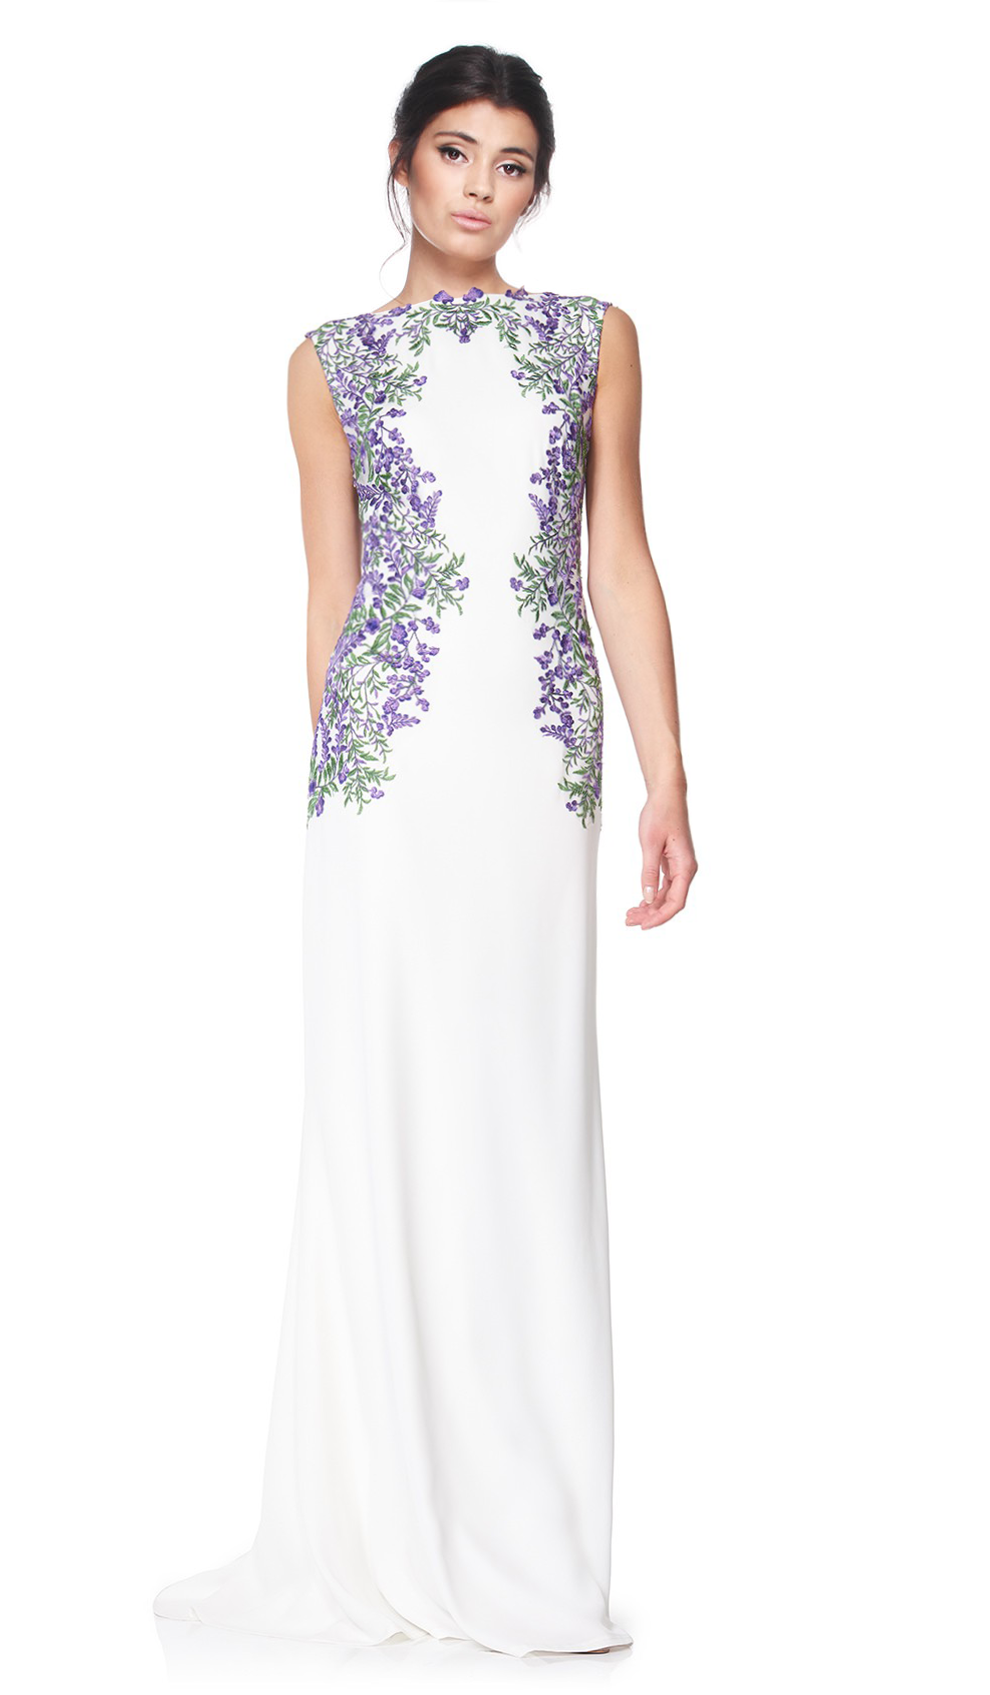 Bridesmaid Wedding Dress HireGown